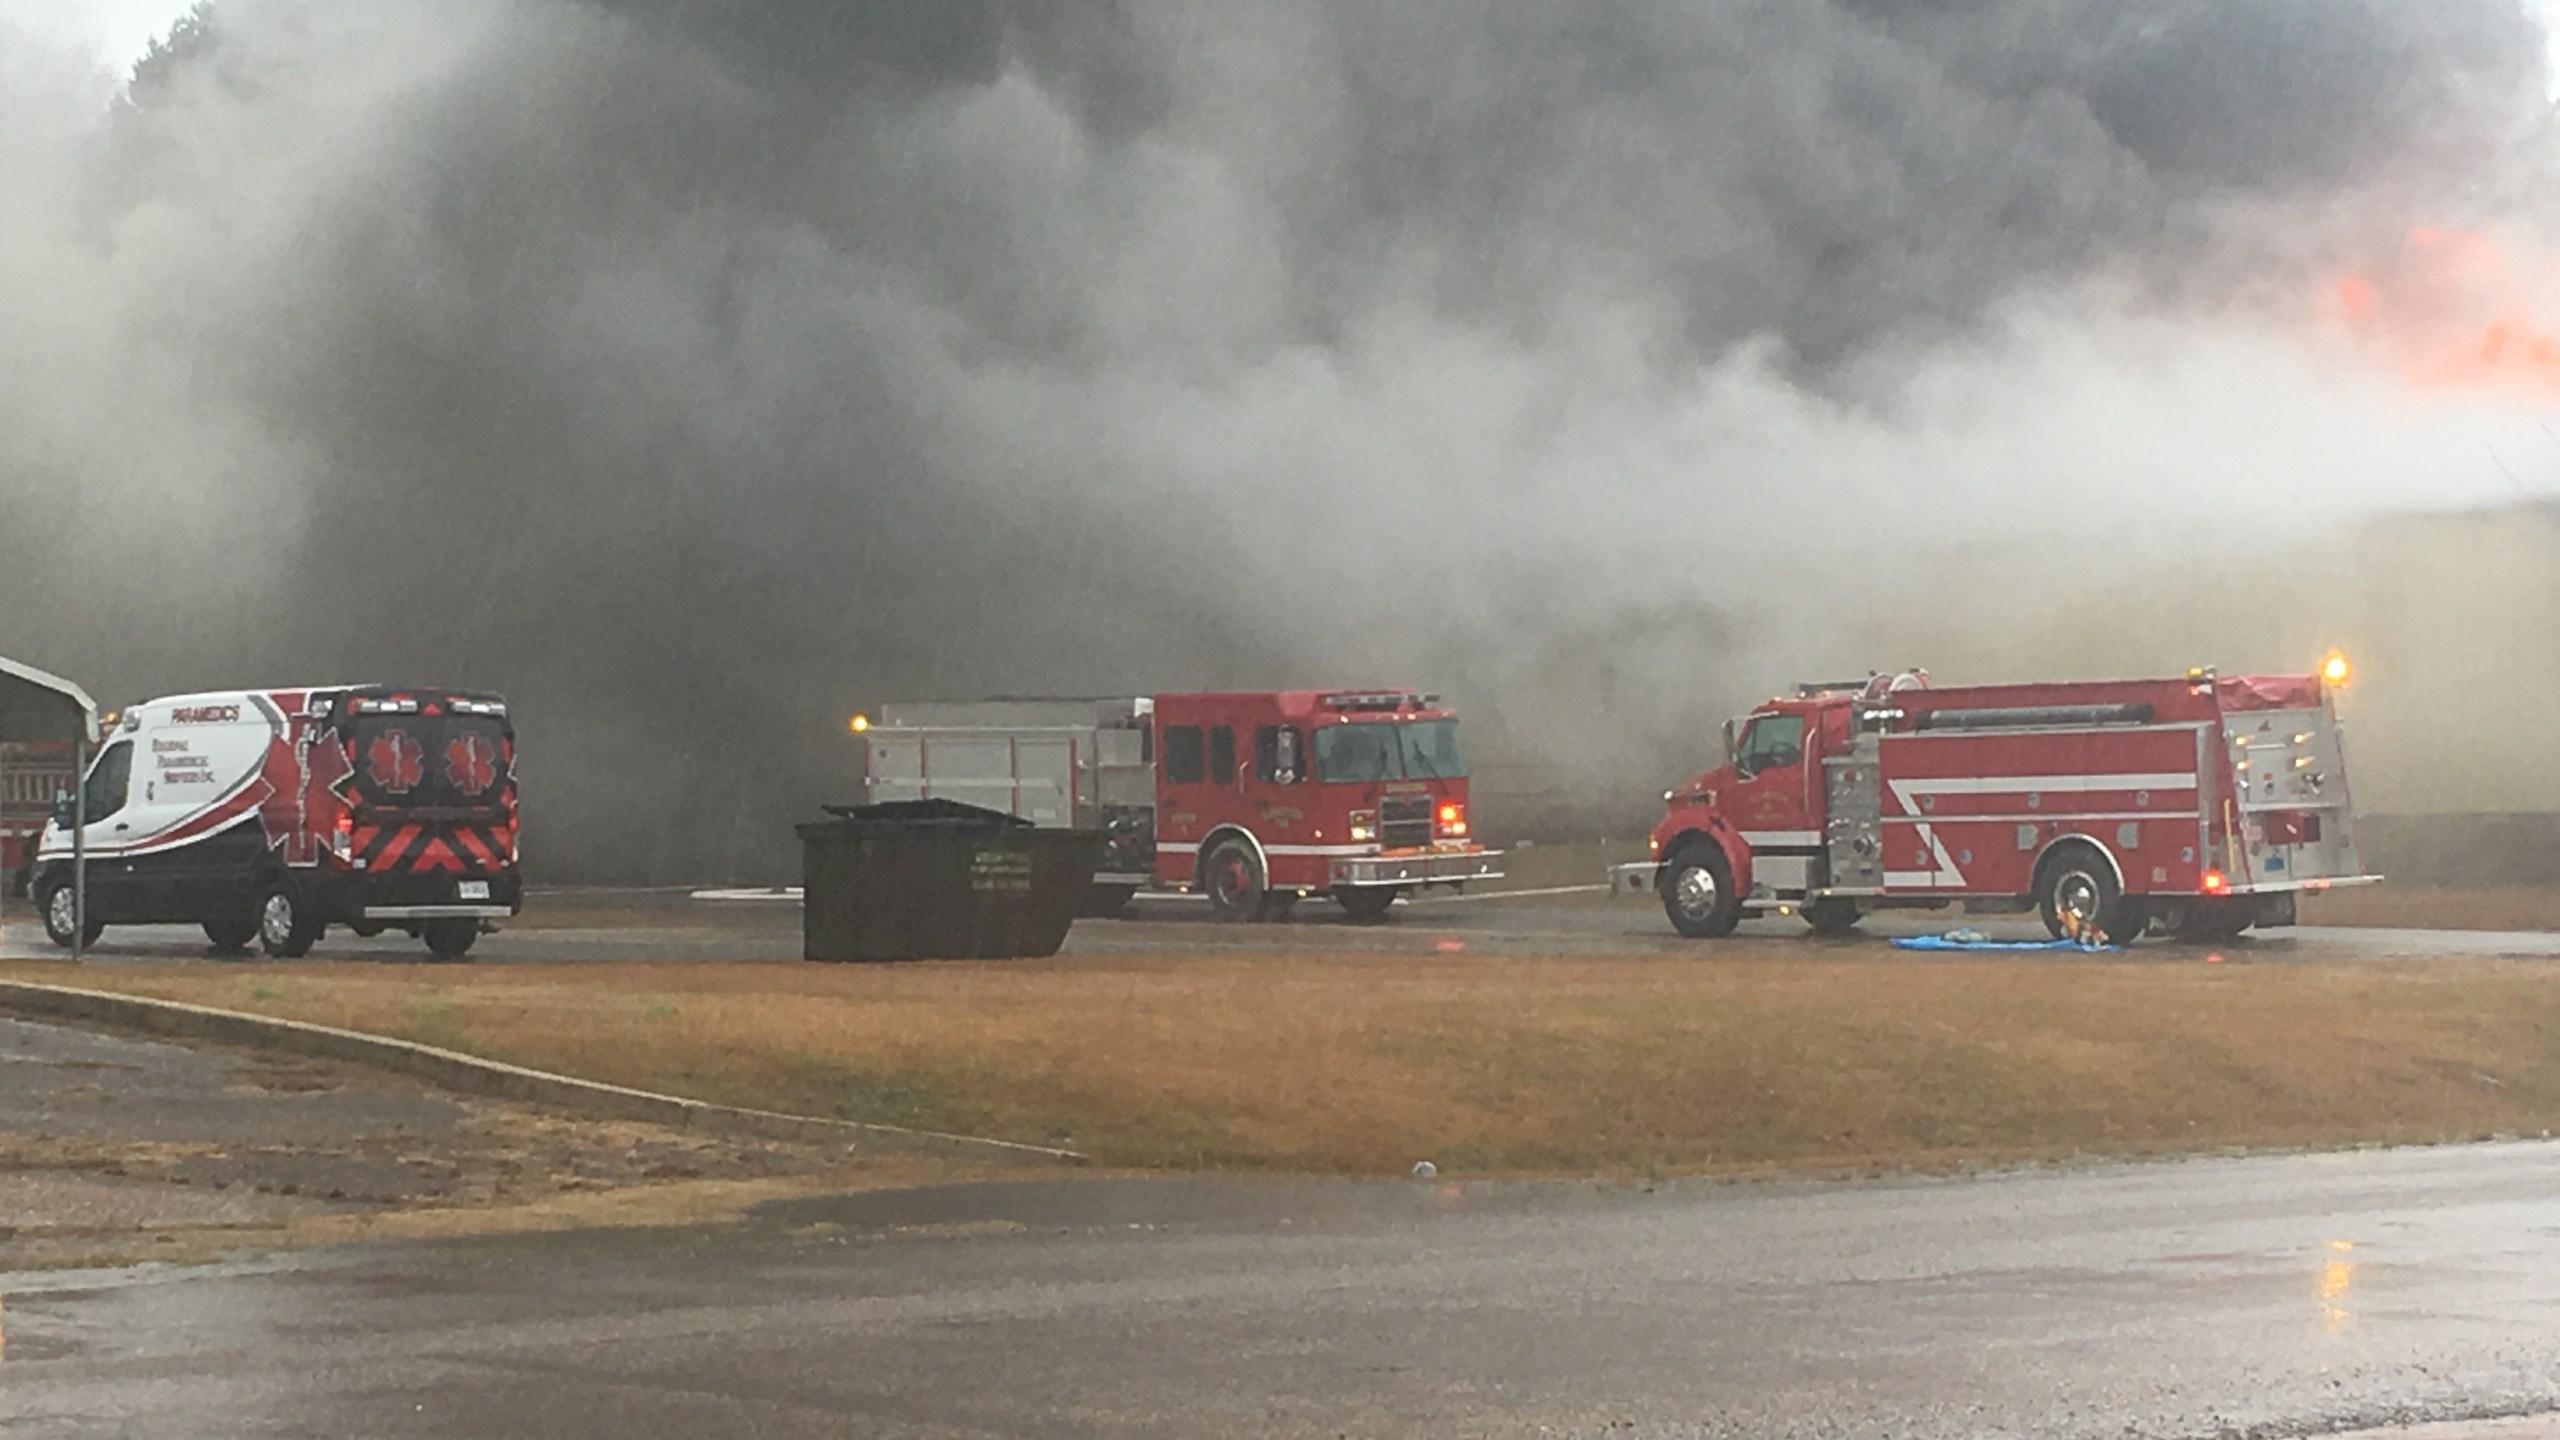 Carbon Hill fire trucks